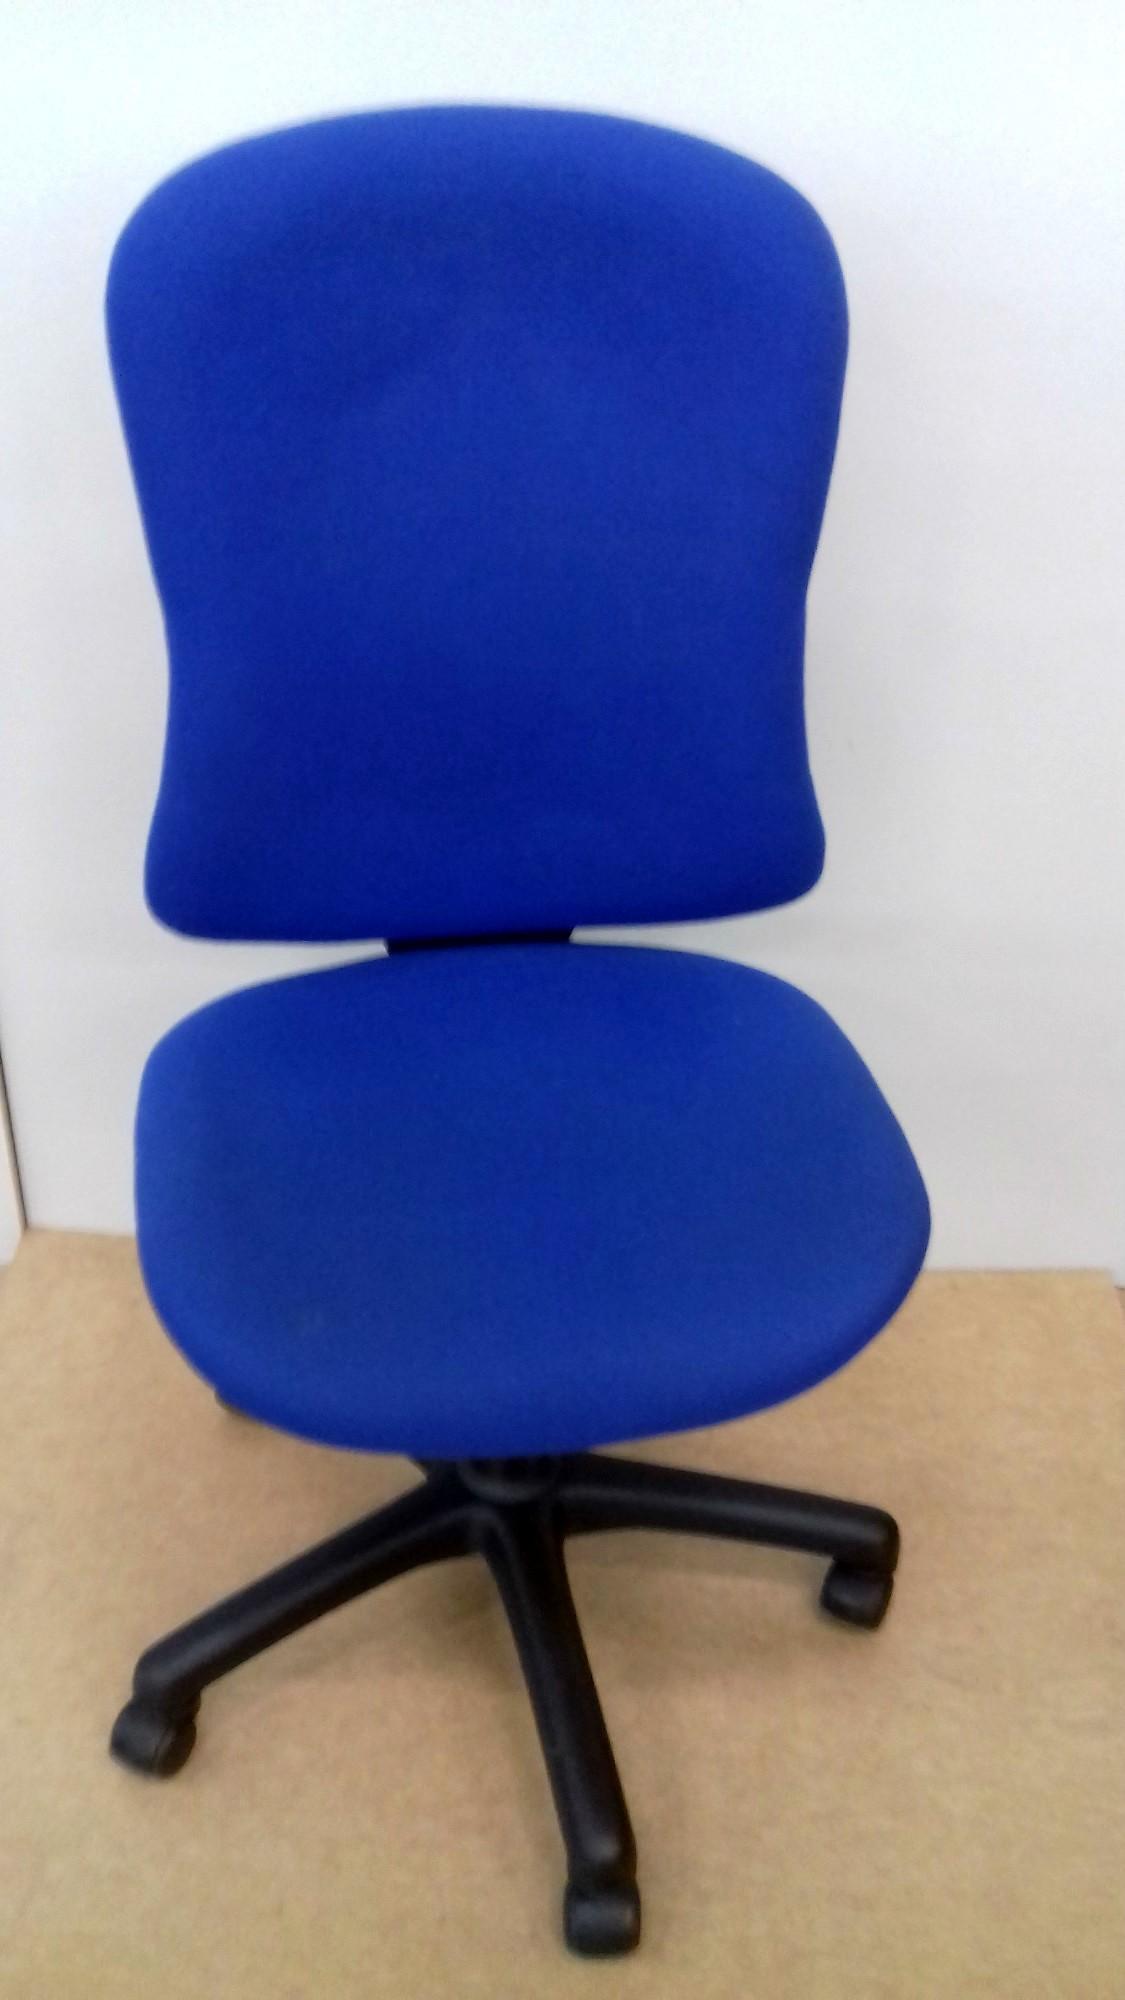 fauteuil team fauteuil d 39 occasion aux ench res agorastore. Black Bedroom Furniture Sets. Home Design Ideas